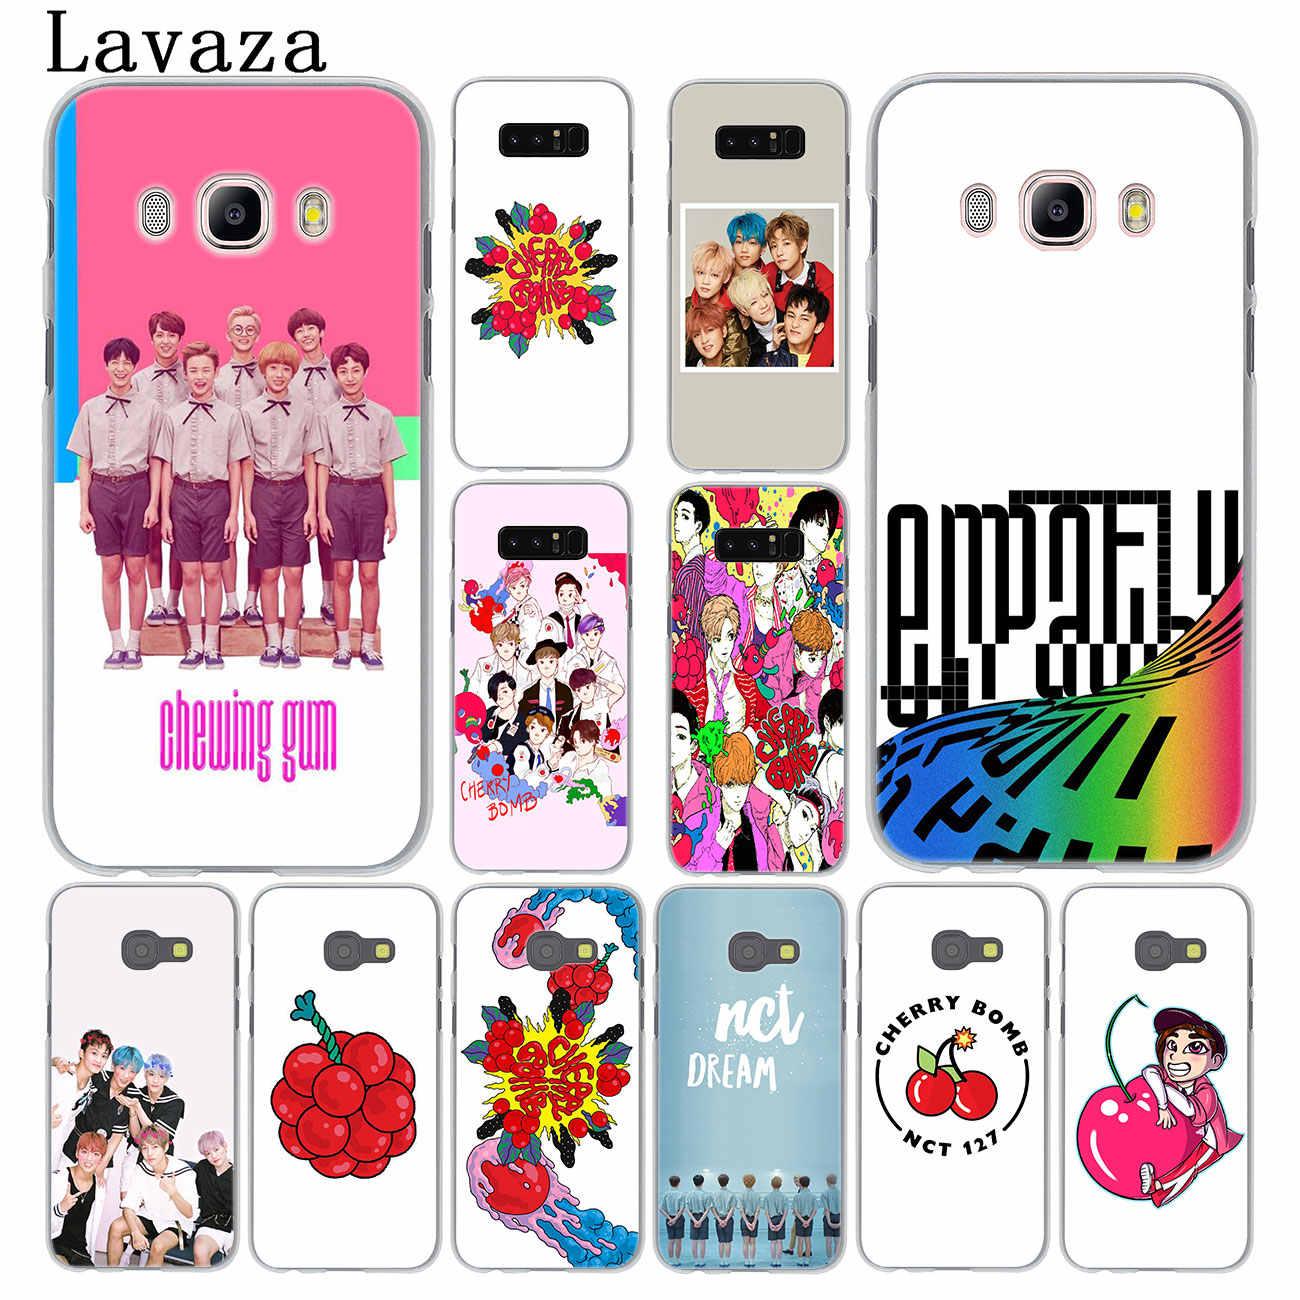 Lavaza NCT 127 U Kpop DREAM Phone Case for Samsung Galaxy A9